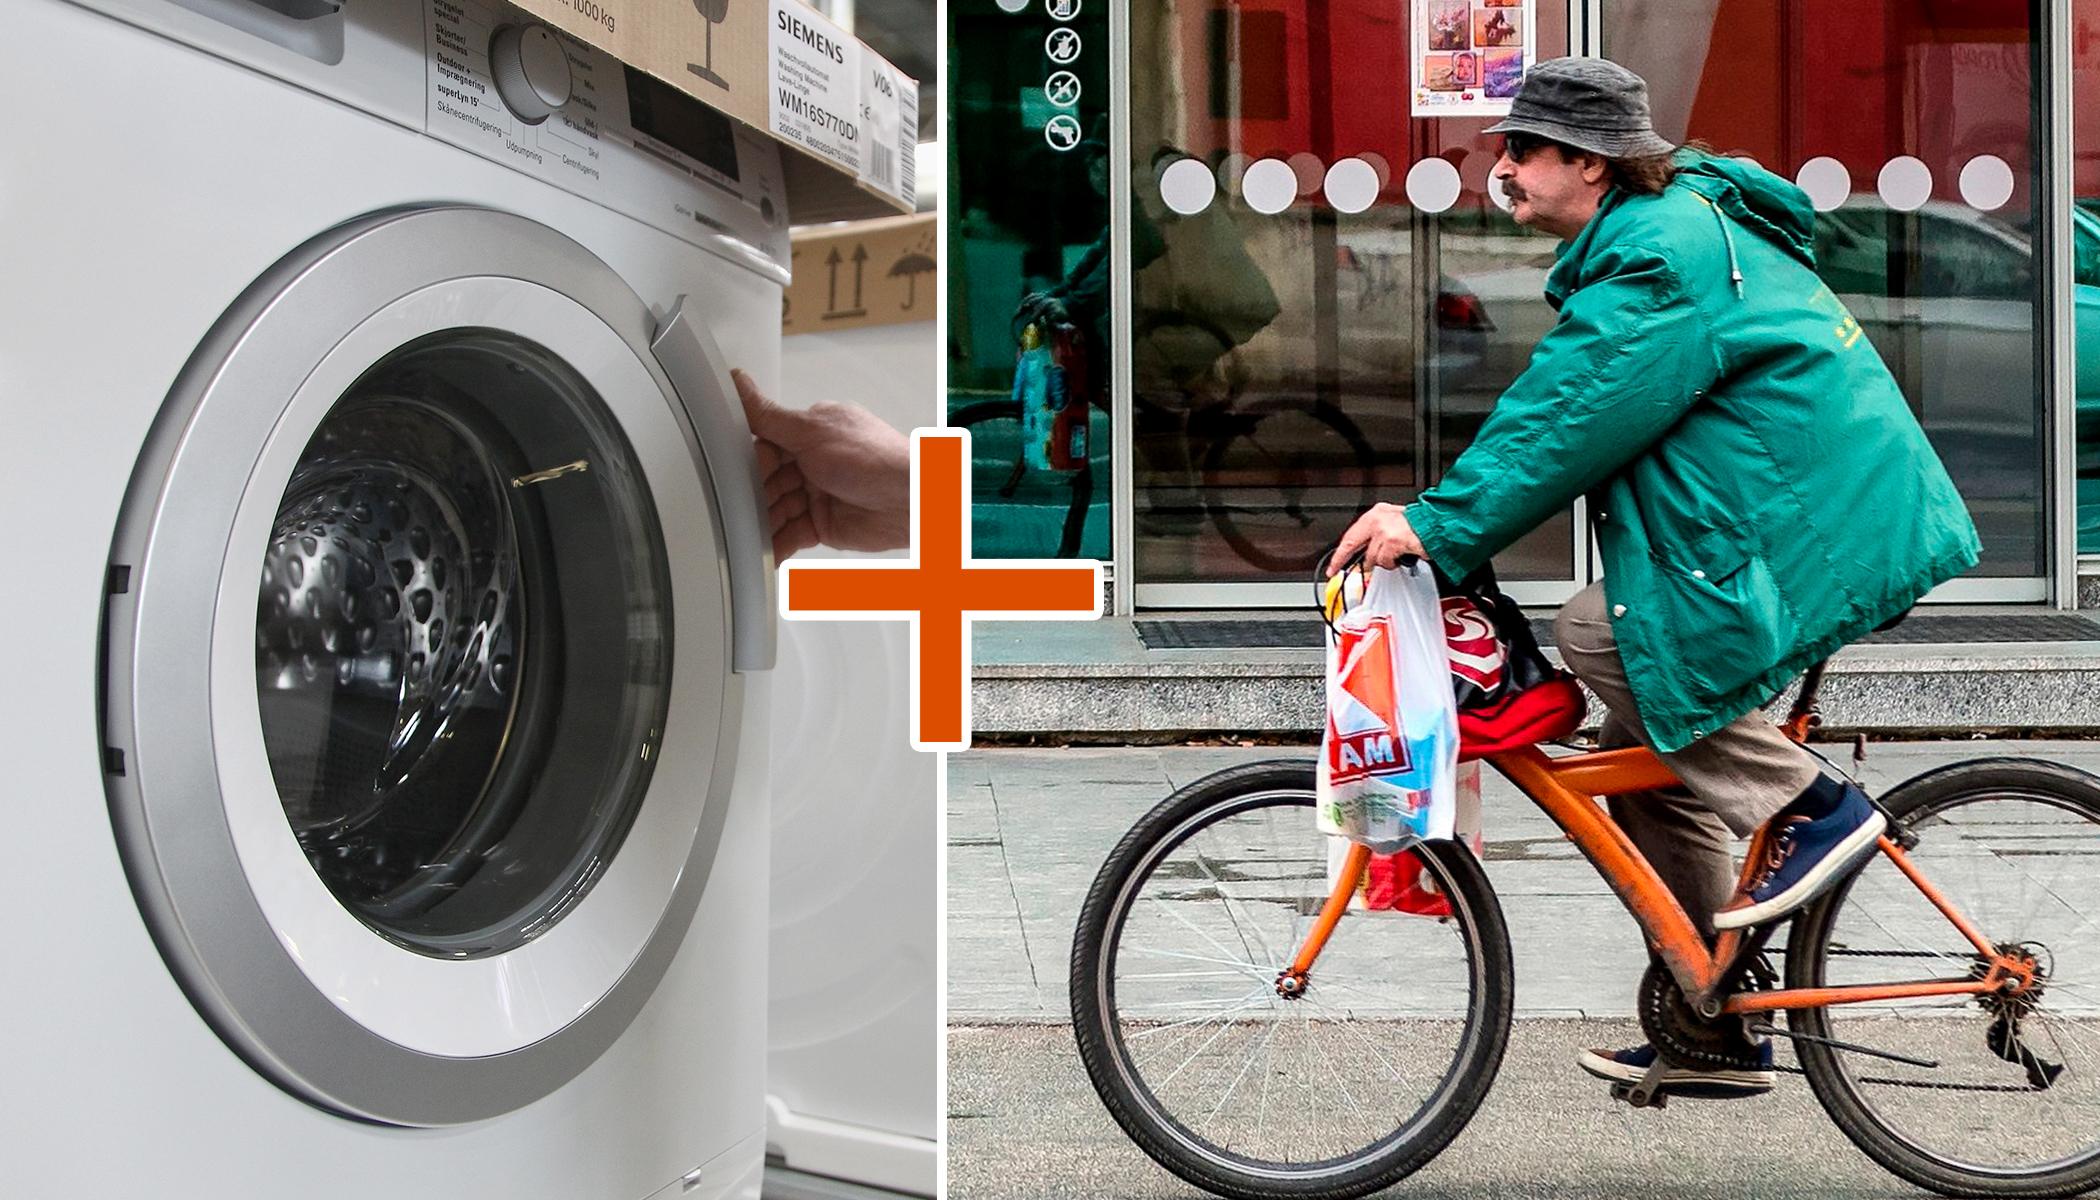 Bike Washing Machine >> Innovative Bike Washing Machine Combines Stationary Bike Exercise